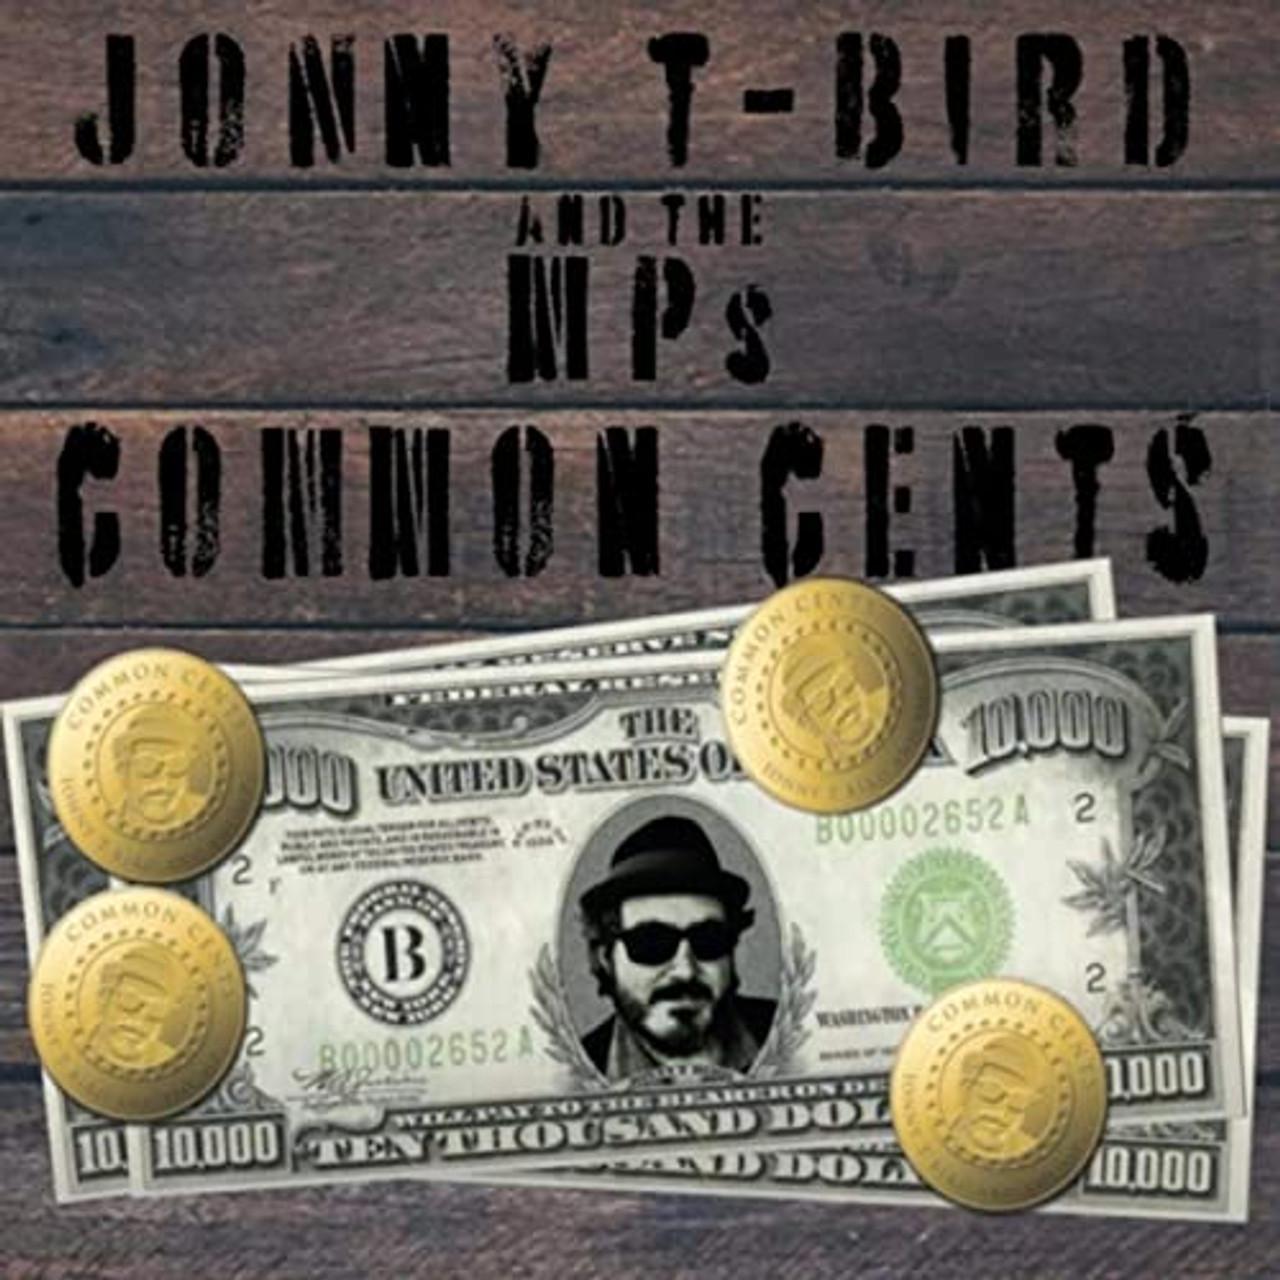 JONNY T-BIRD & THE MPS - COMMON CENTS